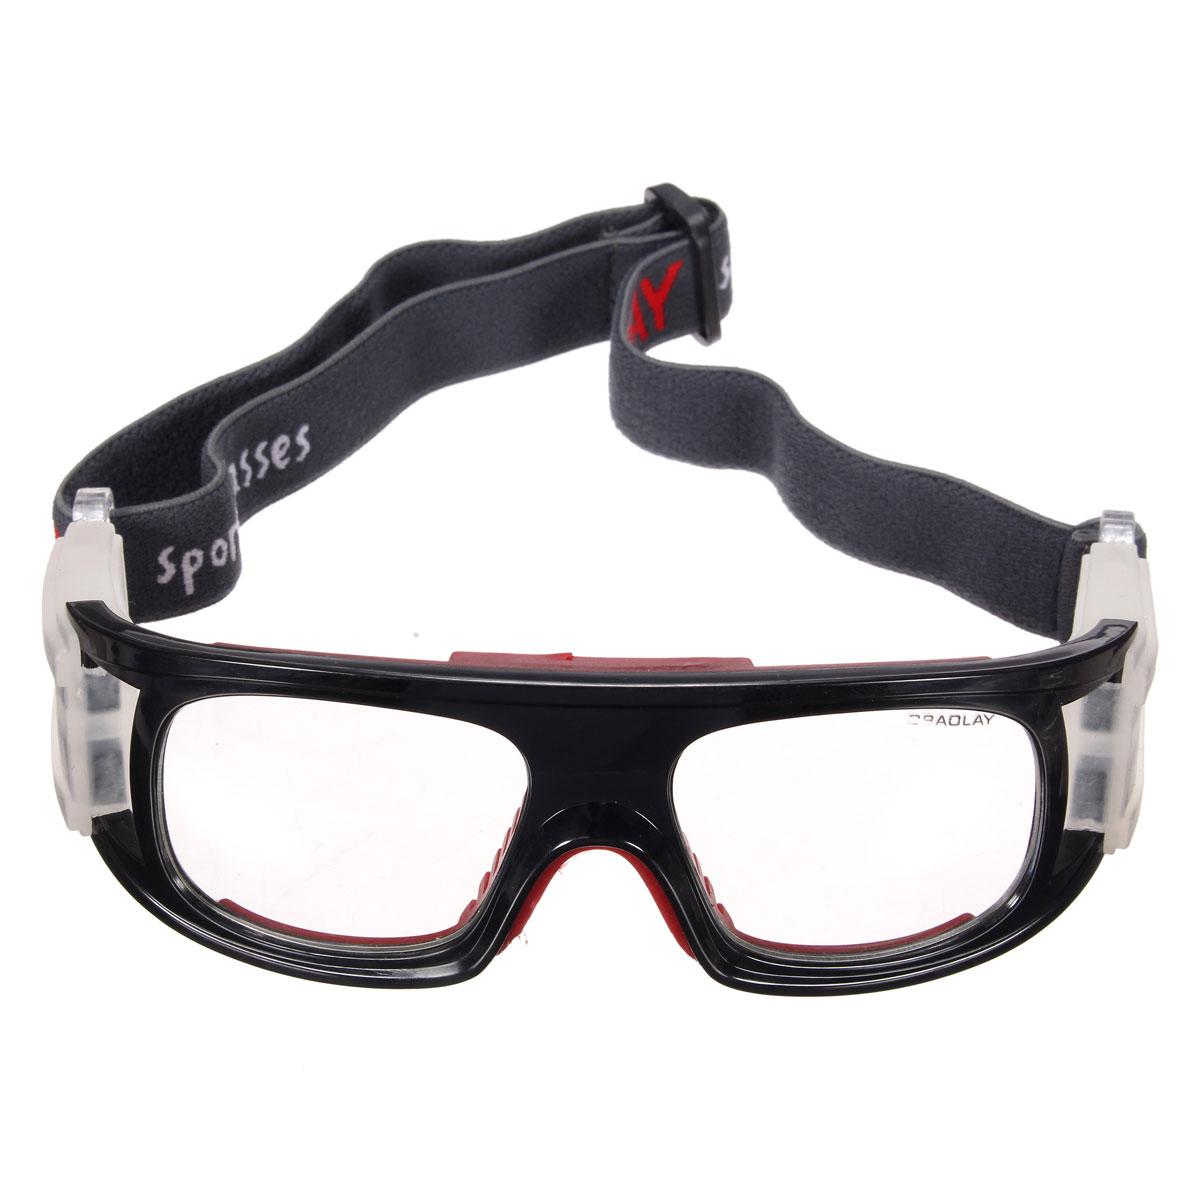 basketball soccer football sports protective eyewear